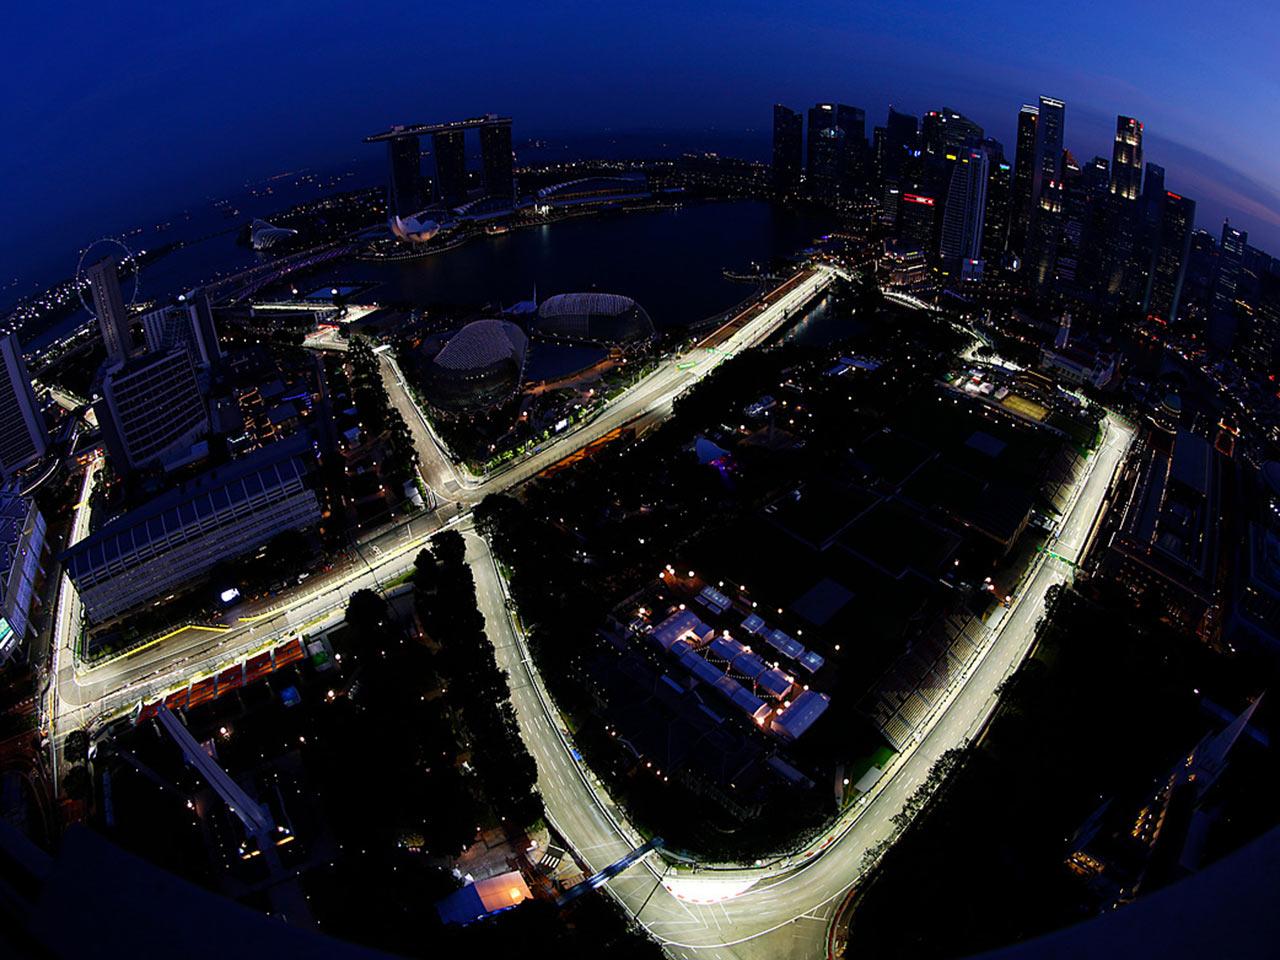 Singapore F1 aerial view